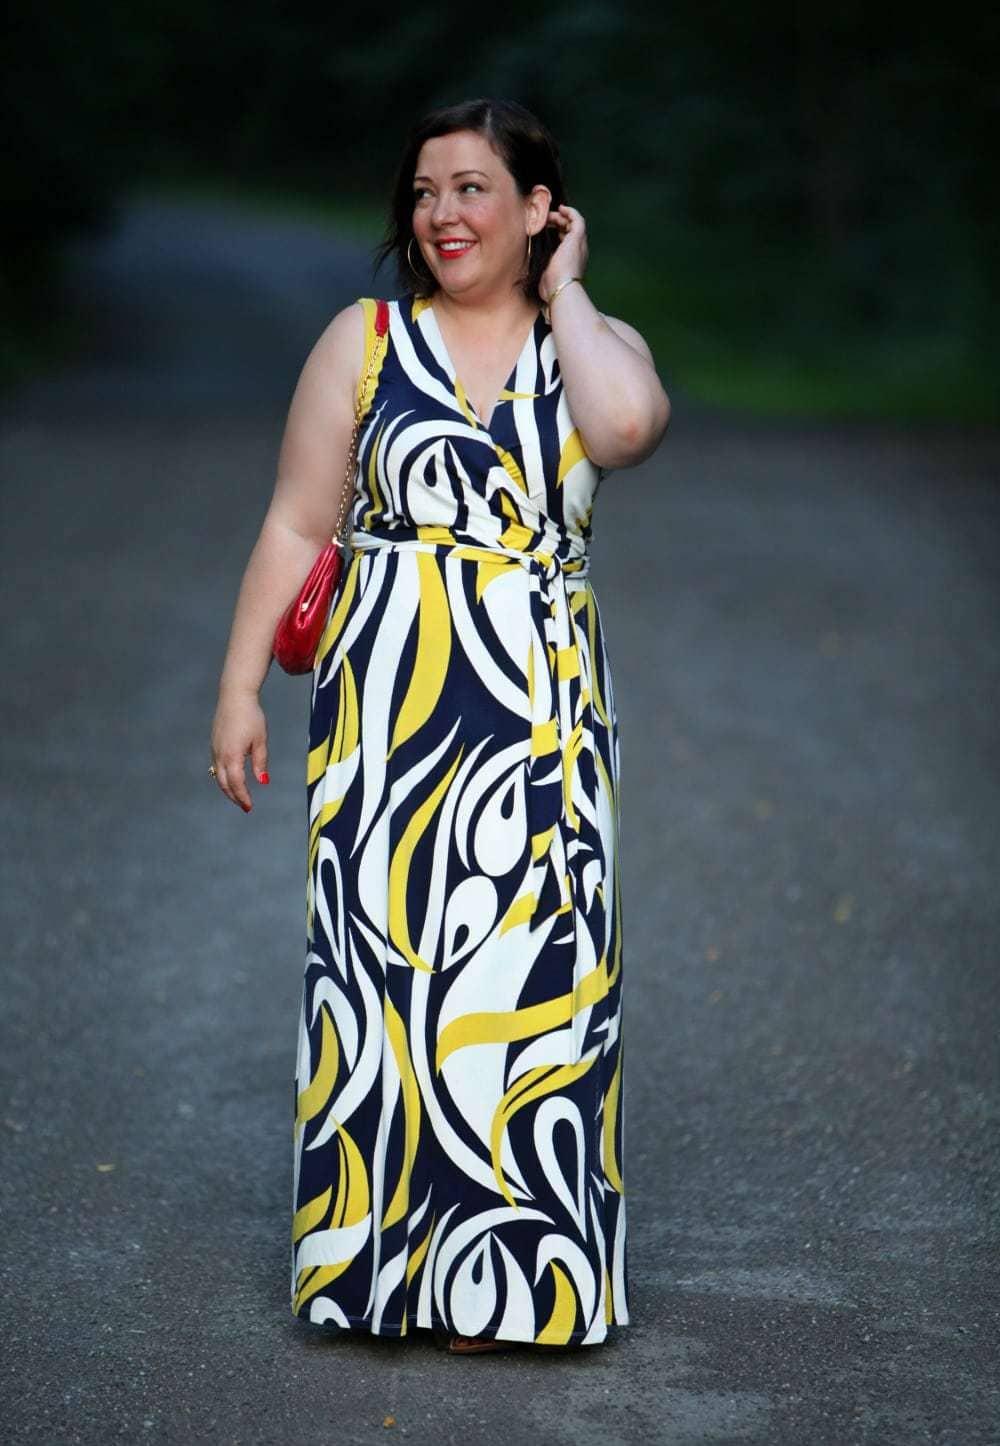 wardrobe oxygen over 40 blogger in boden maxi dress